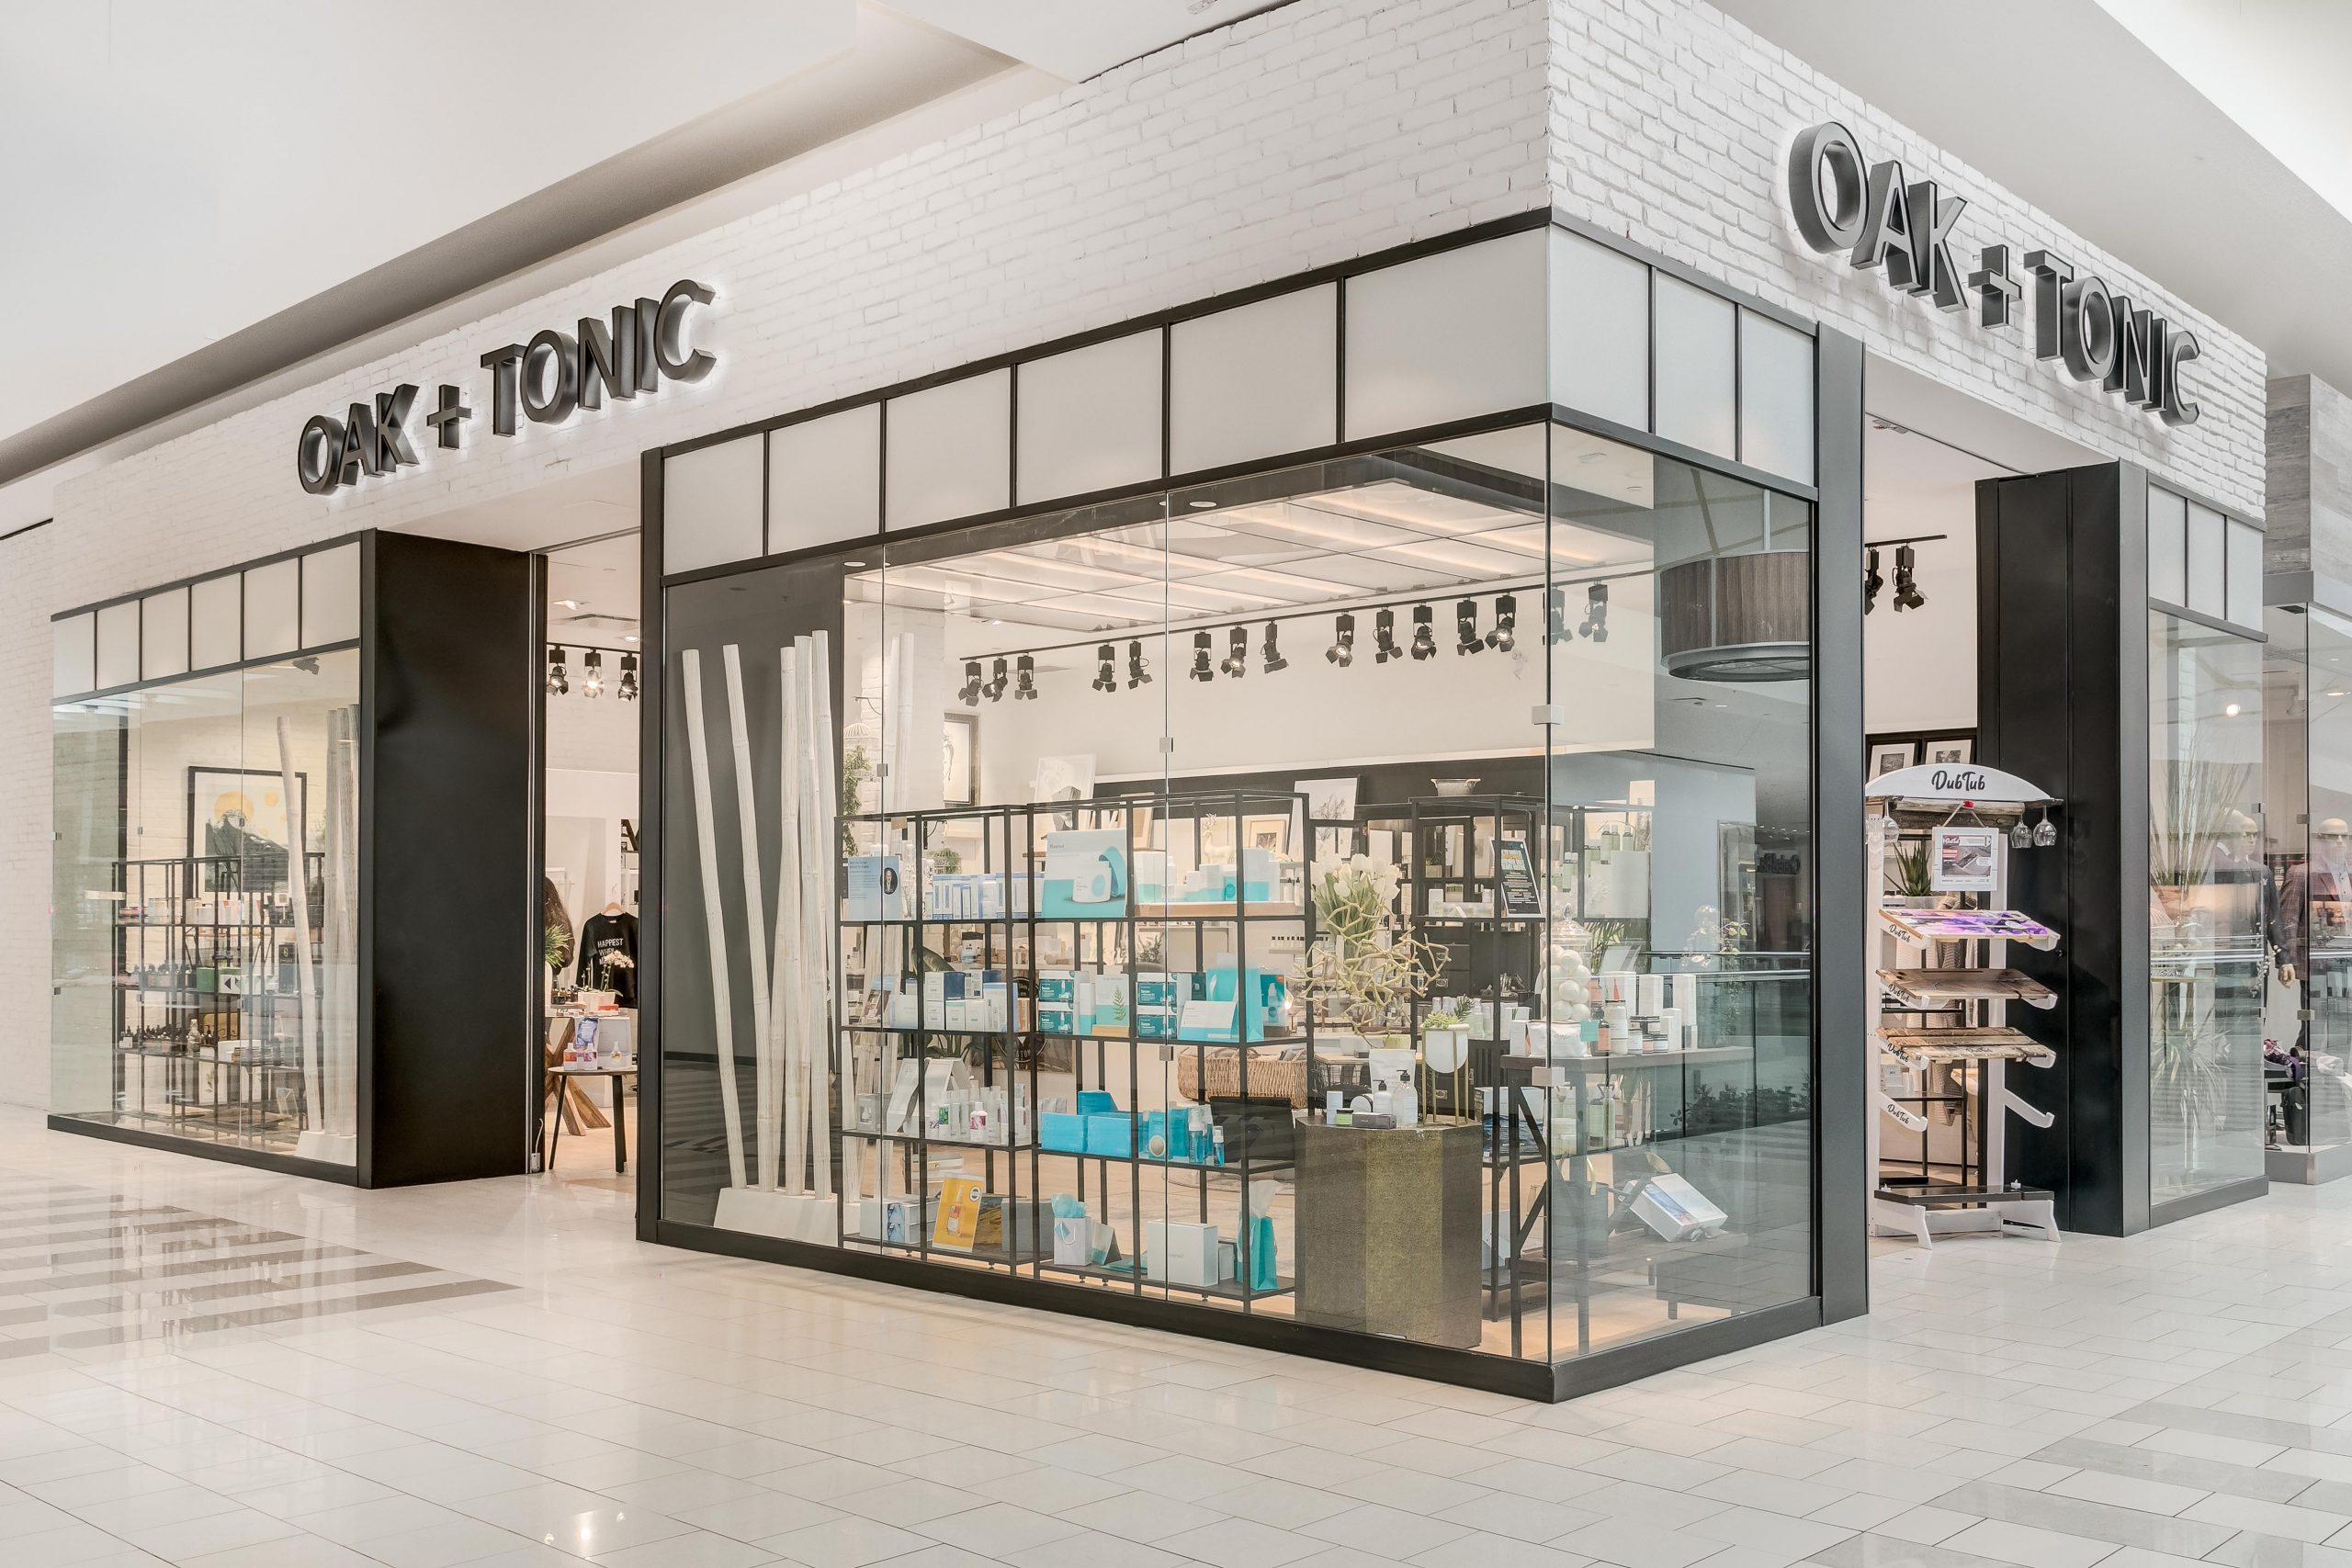 Oak + Tonic storefront